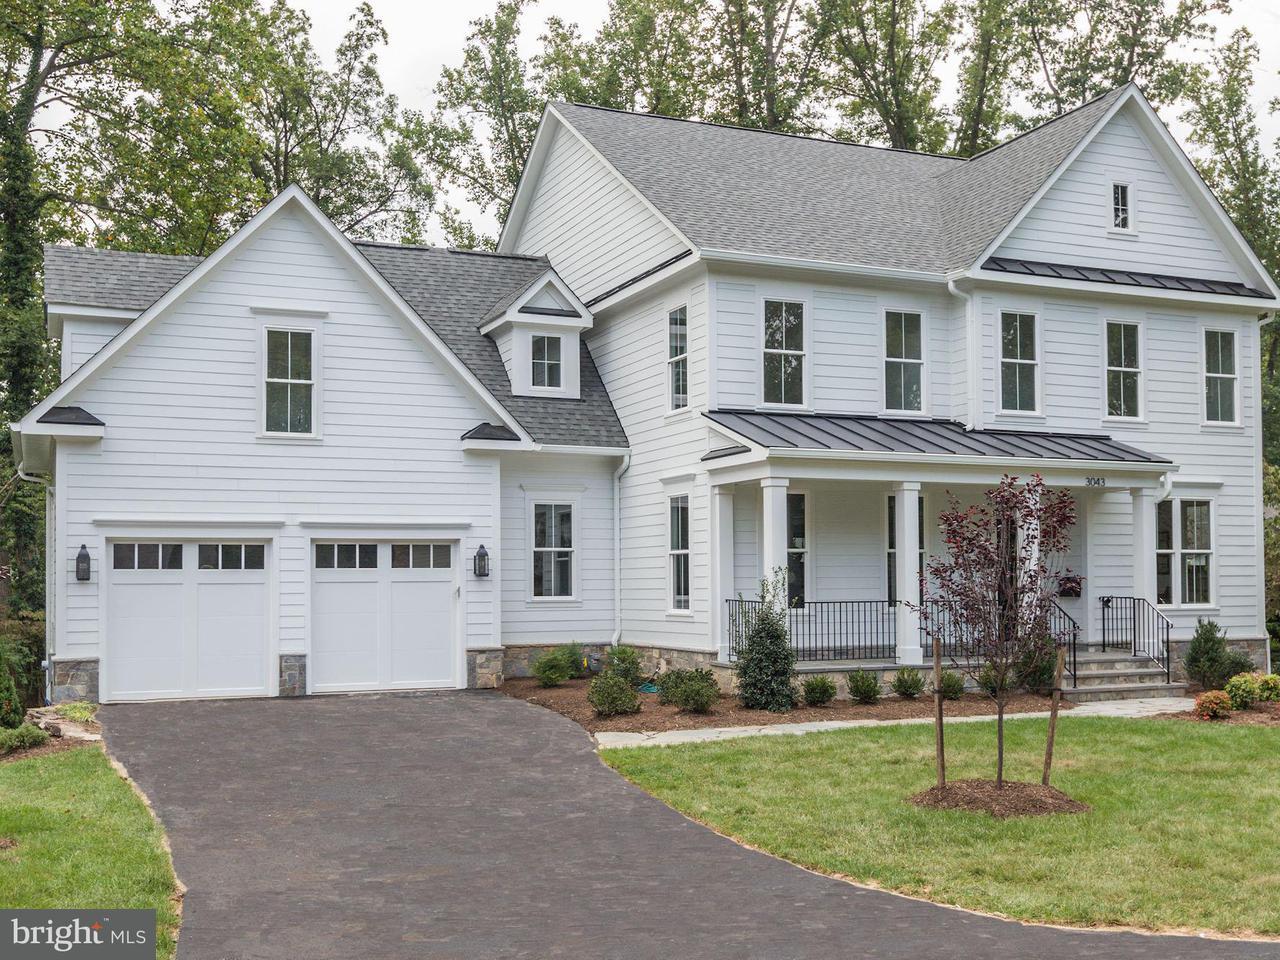 Single Family Home for Sale at 3043 HAZELTON Street 3043 HAZELTON Street Falls Church, Virginia 22044 United States